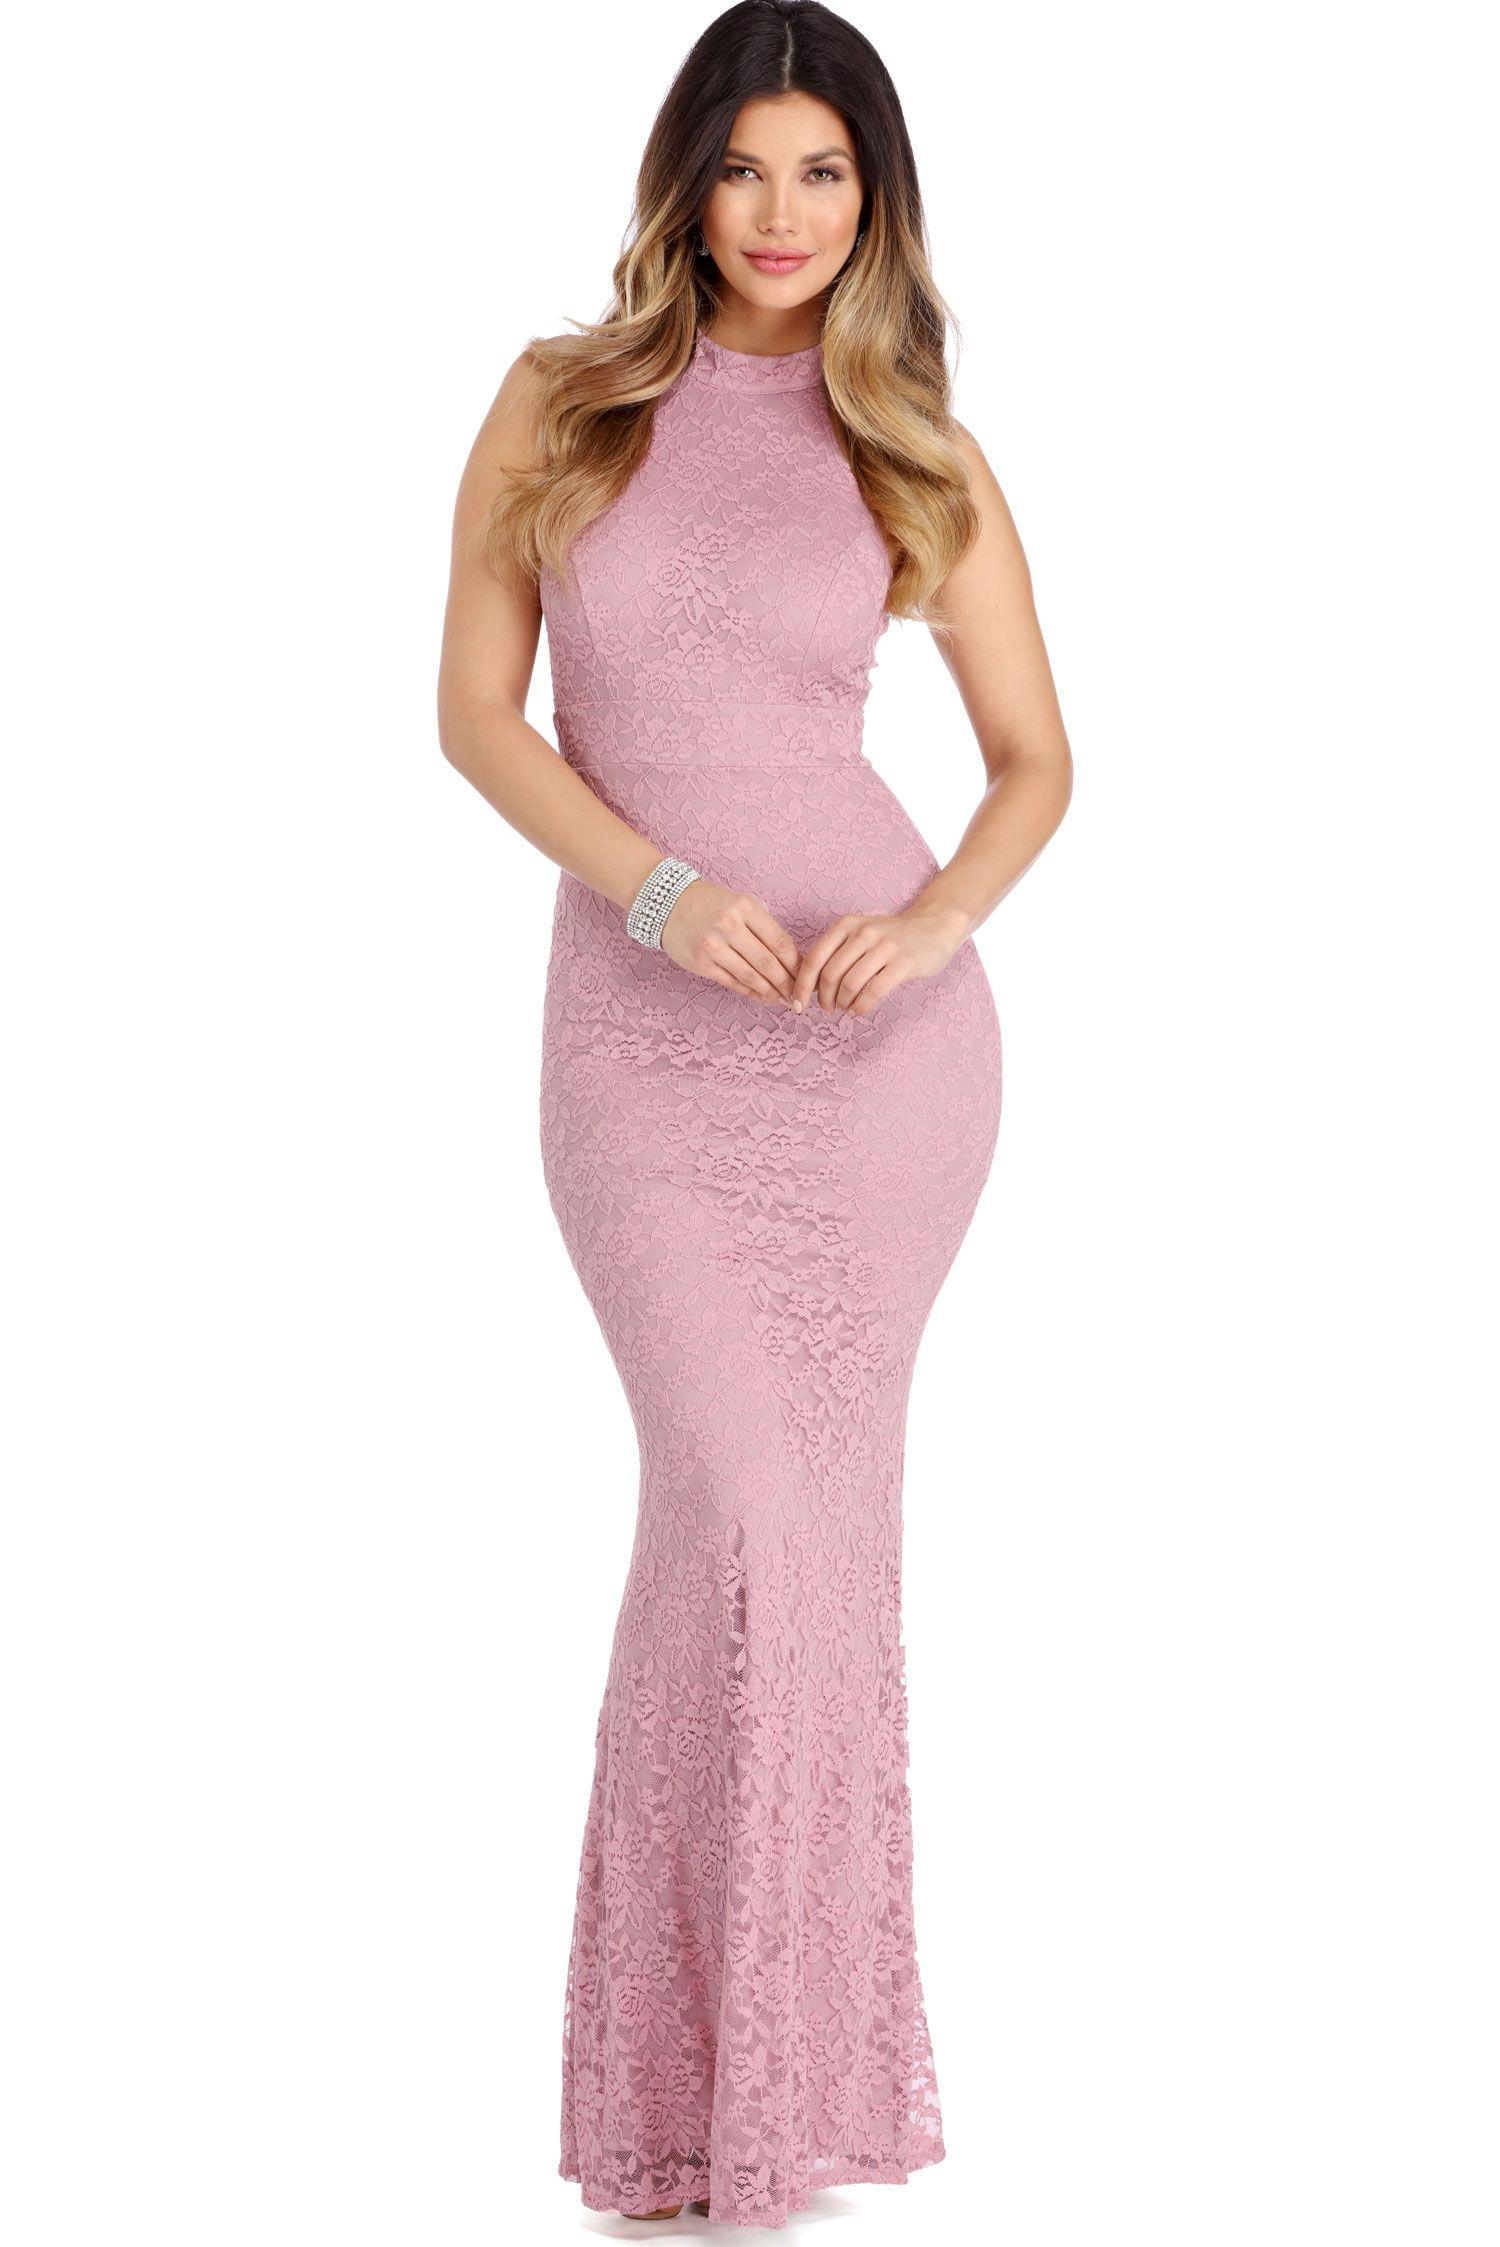 Final sale marcia mauve sweet romance dress mauve red carpet